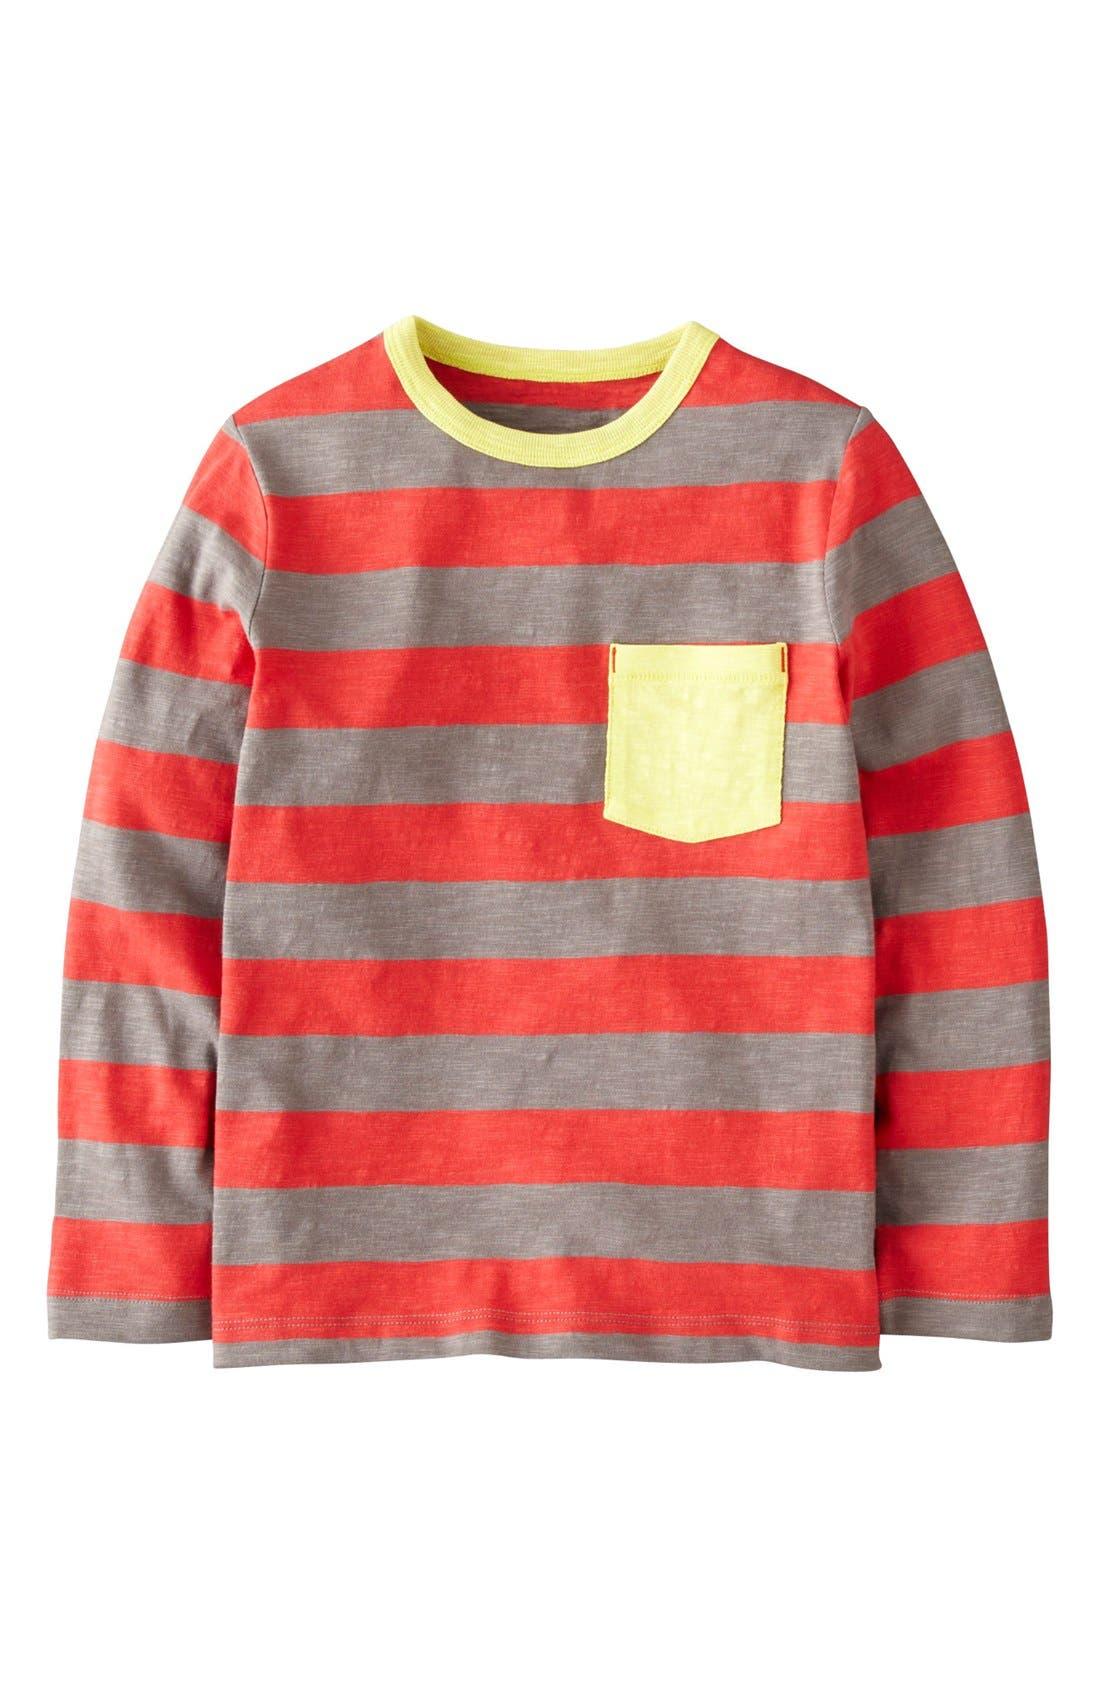 Alternate Image 1 Selected - Mini Boden Color Pop T-Shirt (Toddler Boys, Little Boys & Big Boys)